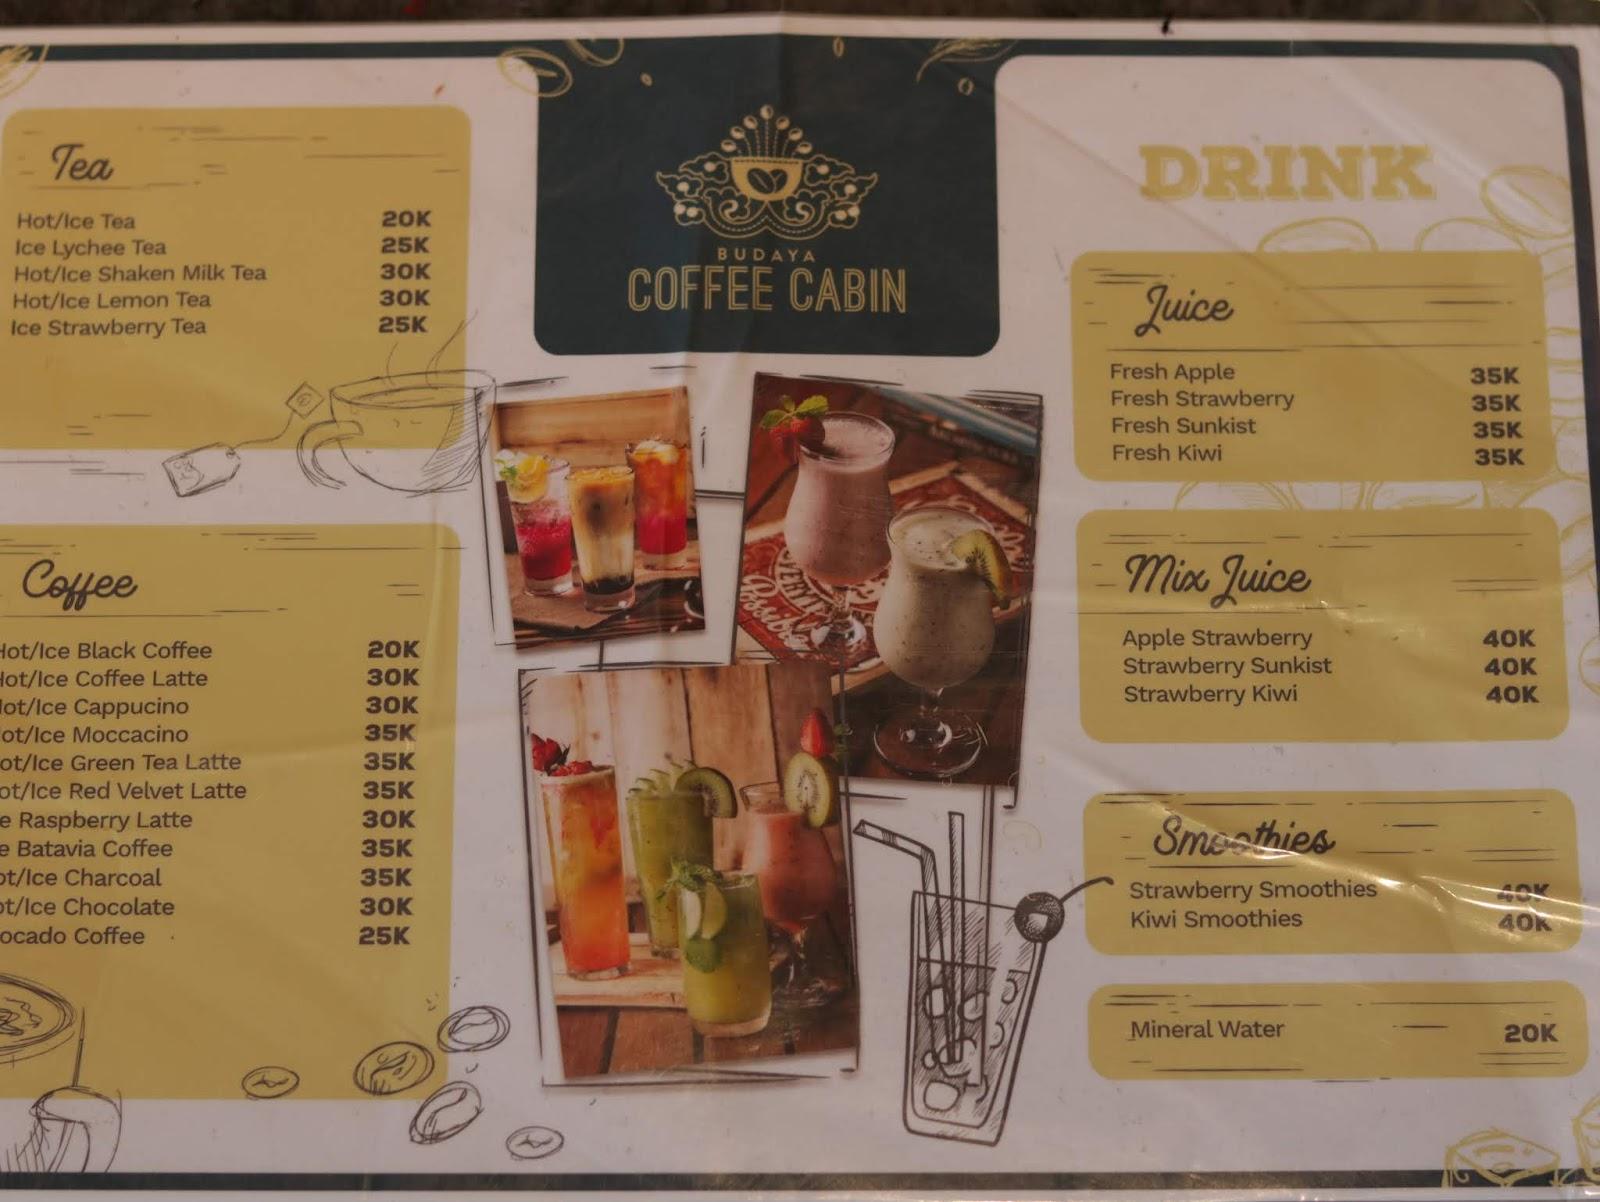 beragam menu minuman di coffecabin budayaland